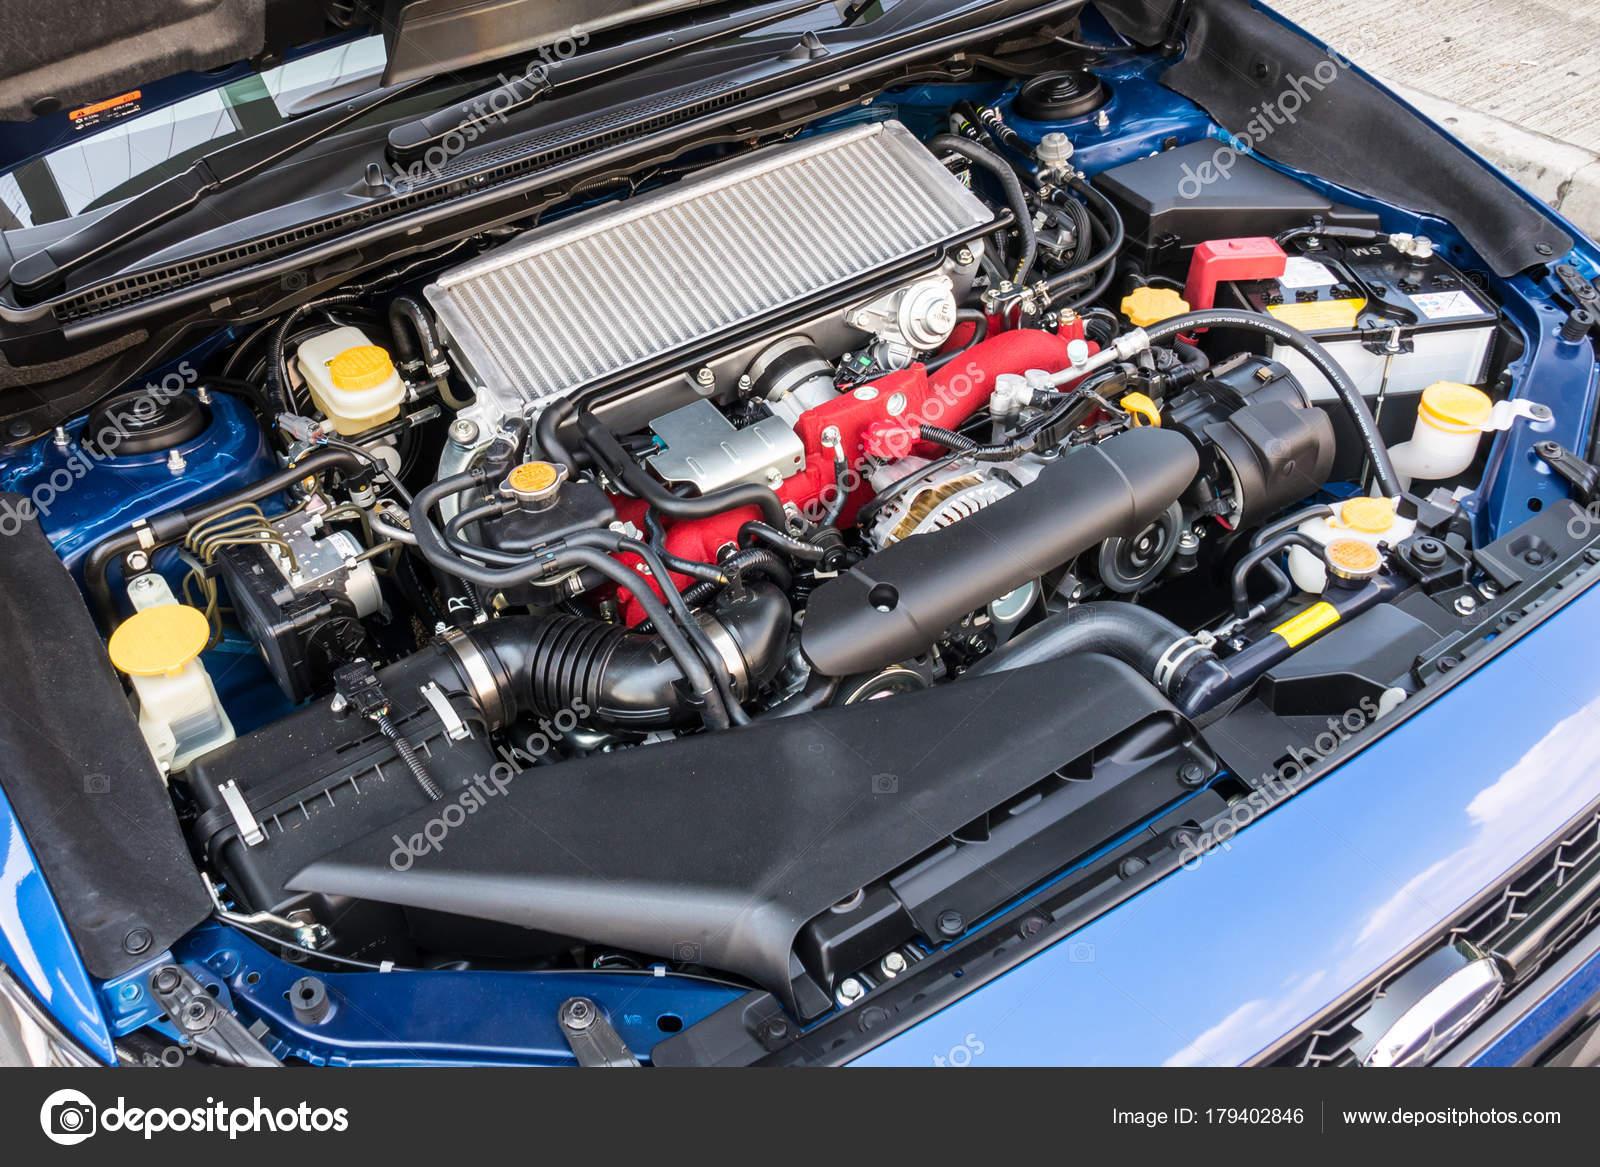 Subaru Wrx Sti 2017 Motor Redaktionelles Stockfoto C Teddyleung